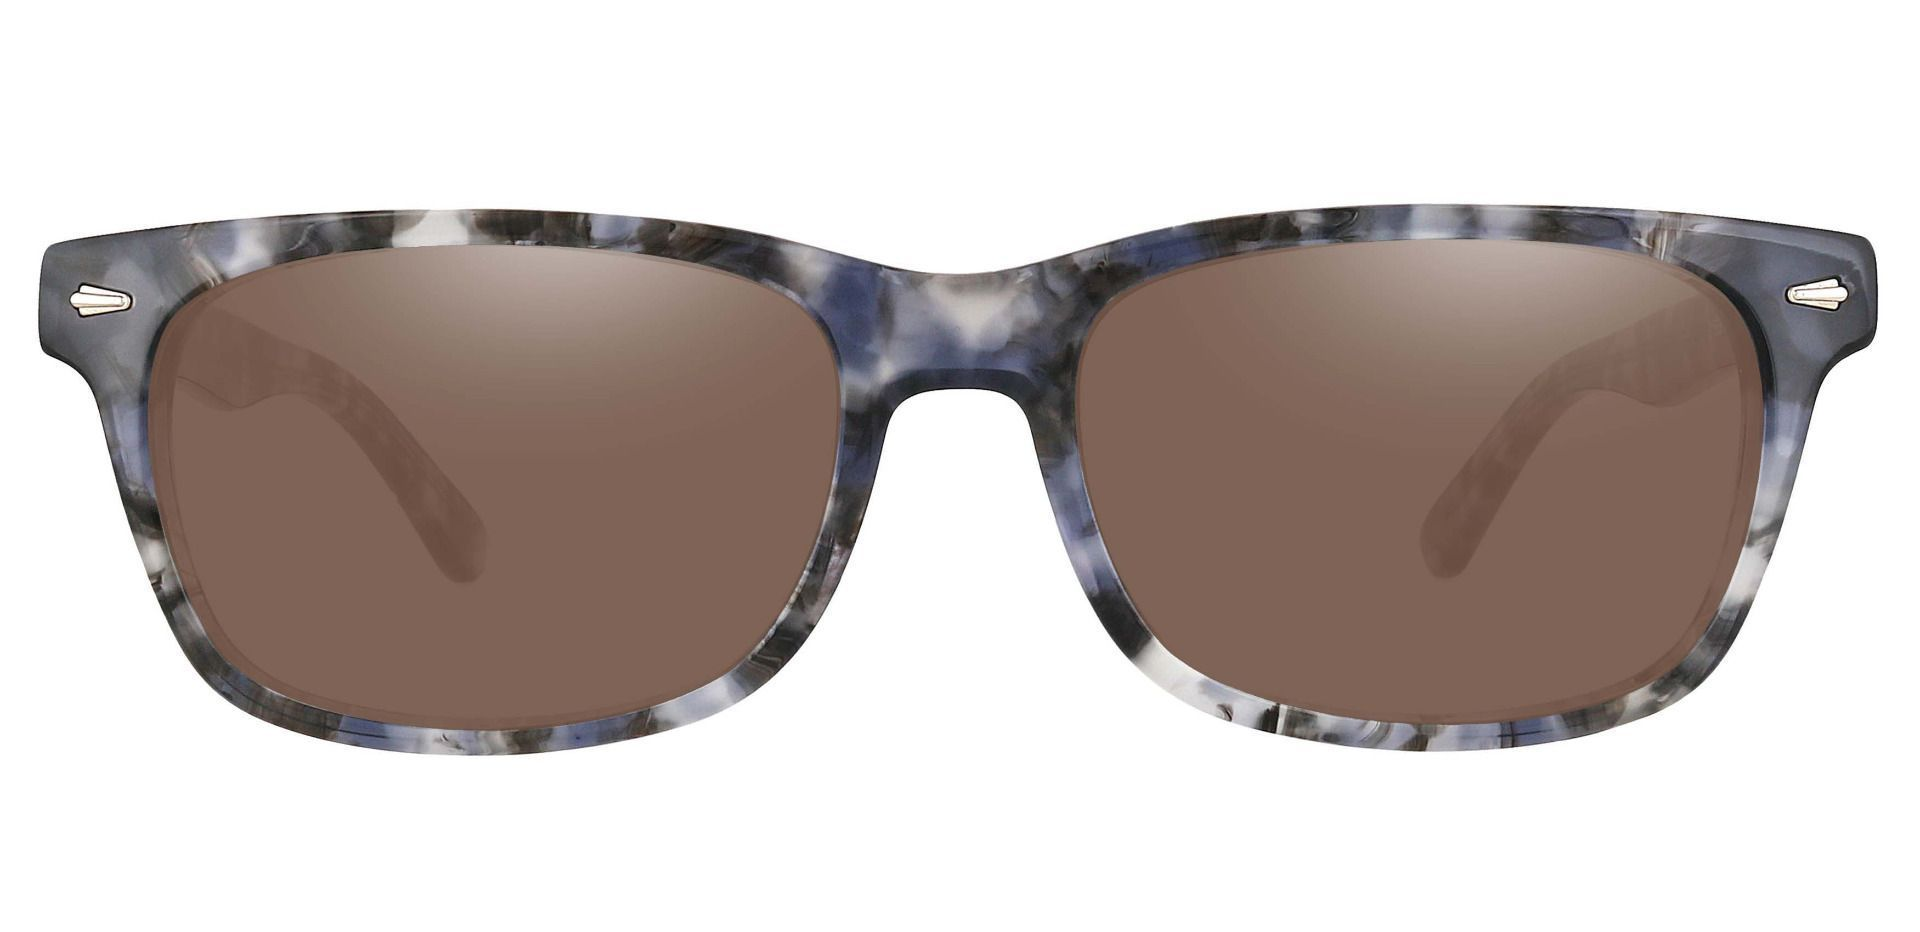 Hendrix Rectangle Progressive Sunglasses - Floral Frame With Brown Lenses